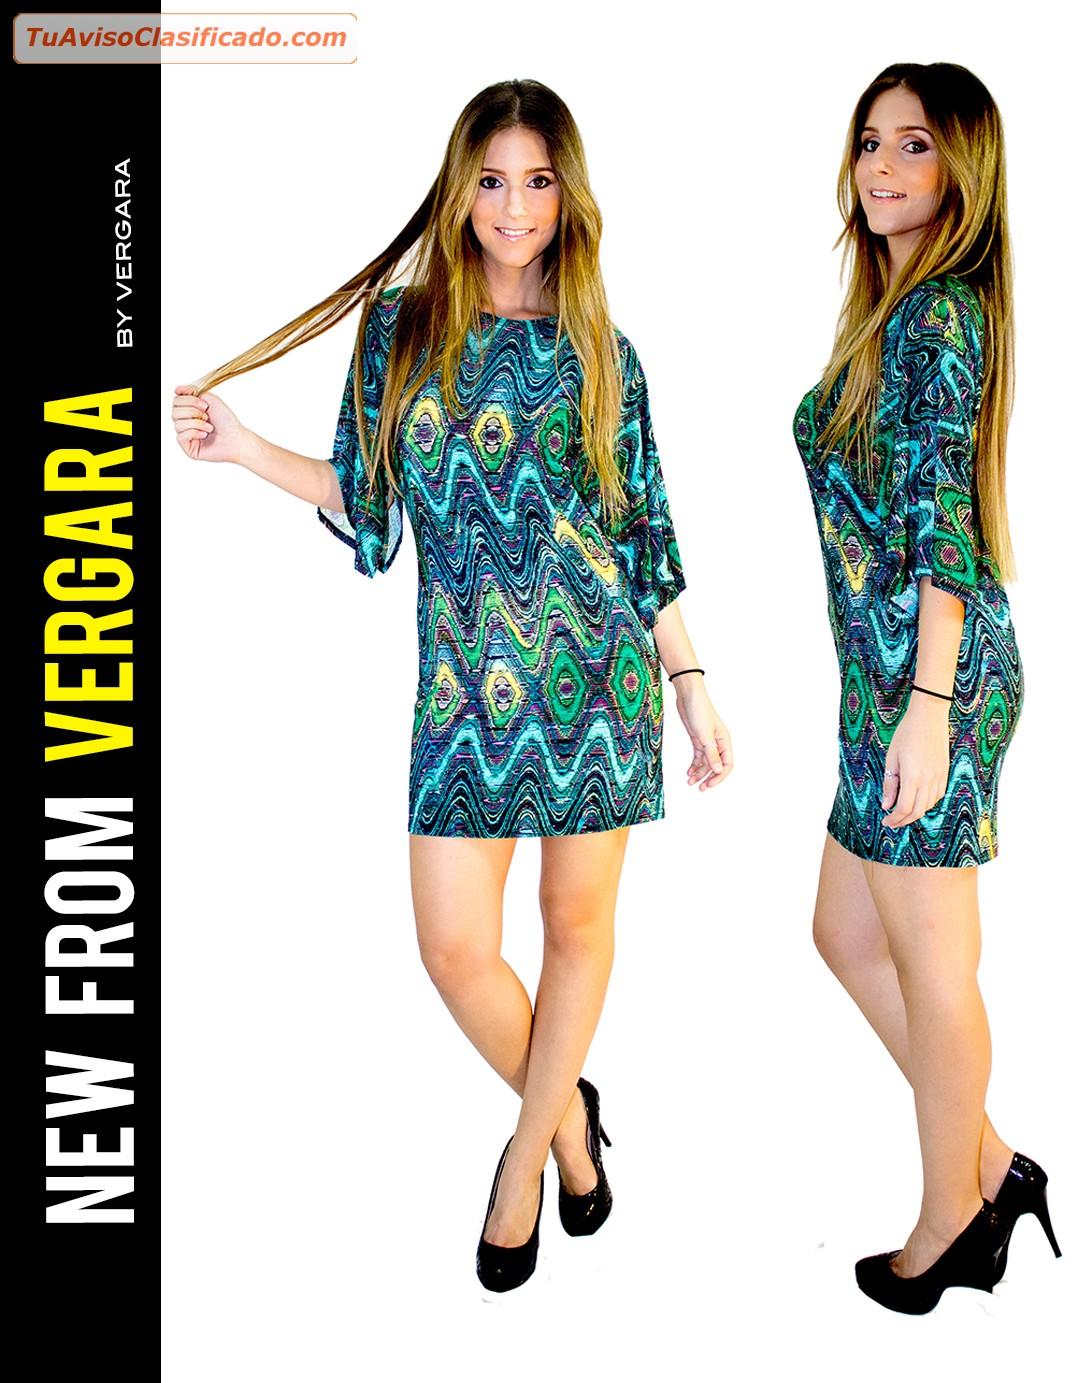 Moda colombiana vestidos